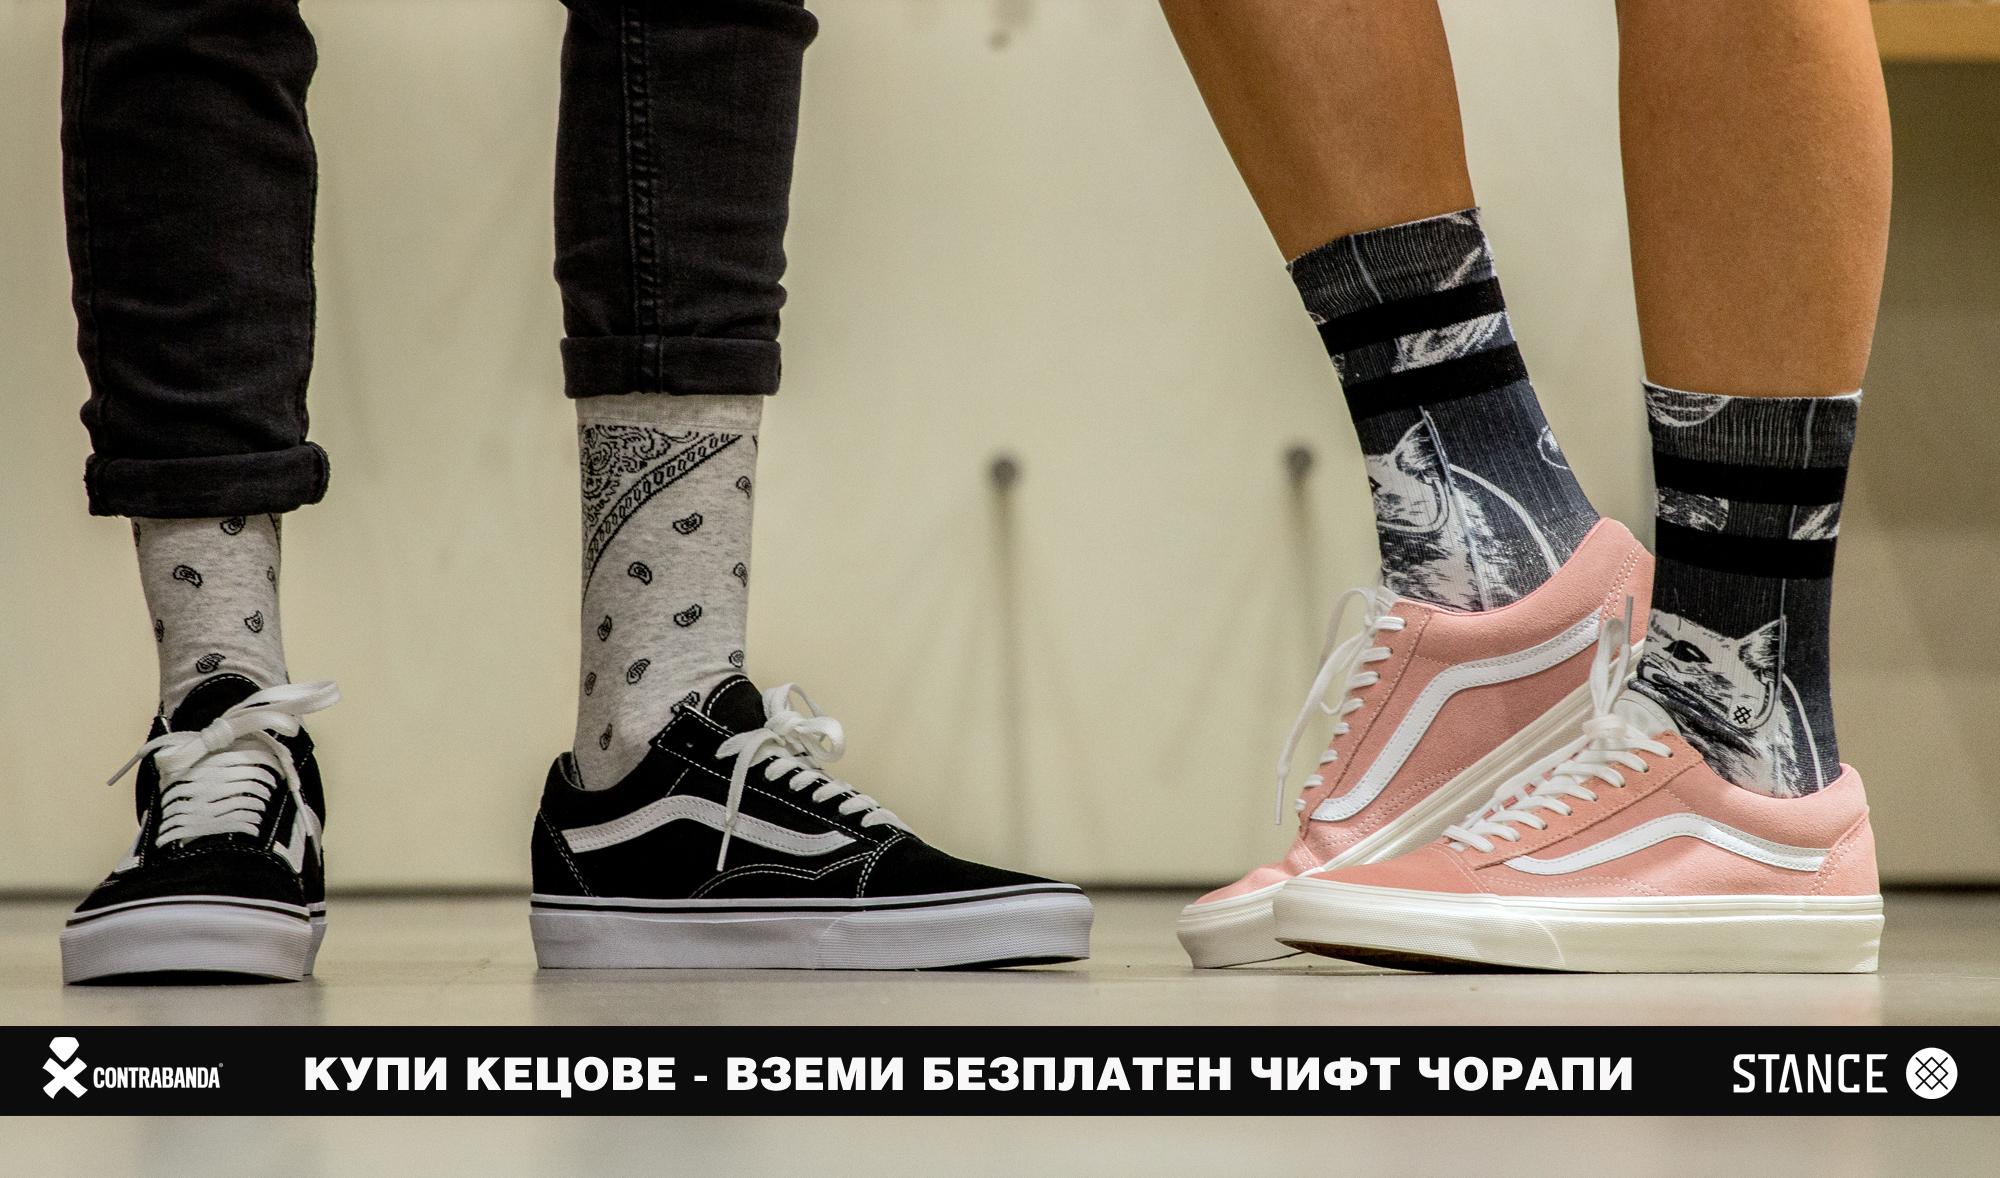 Купуваш кецове - подаряваме ти чорапи Stance